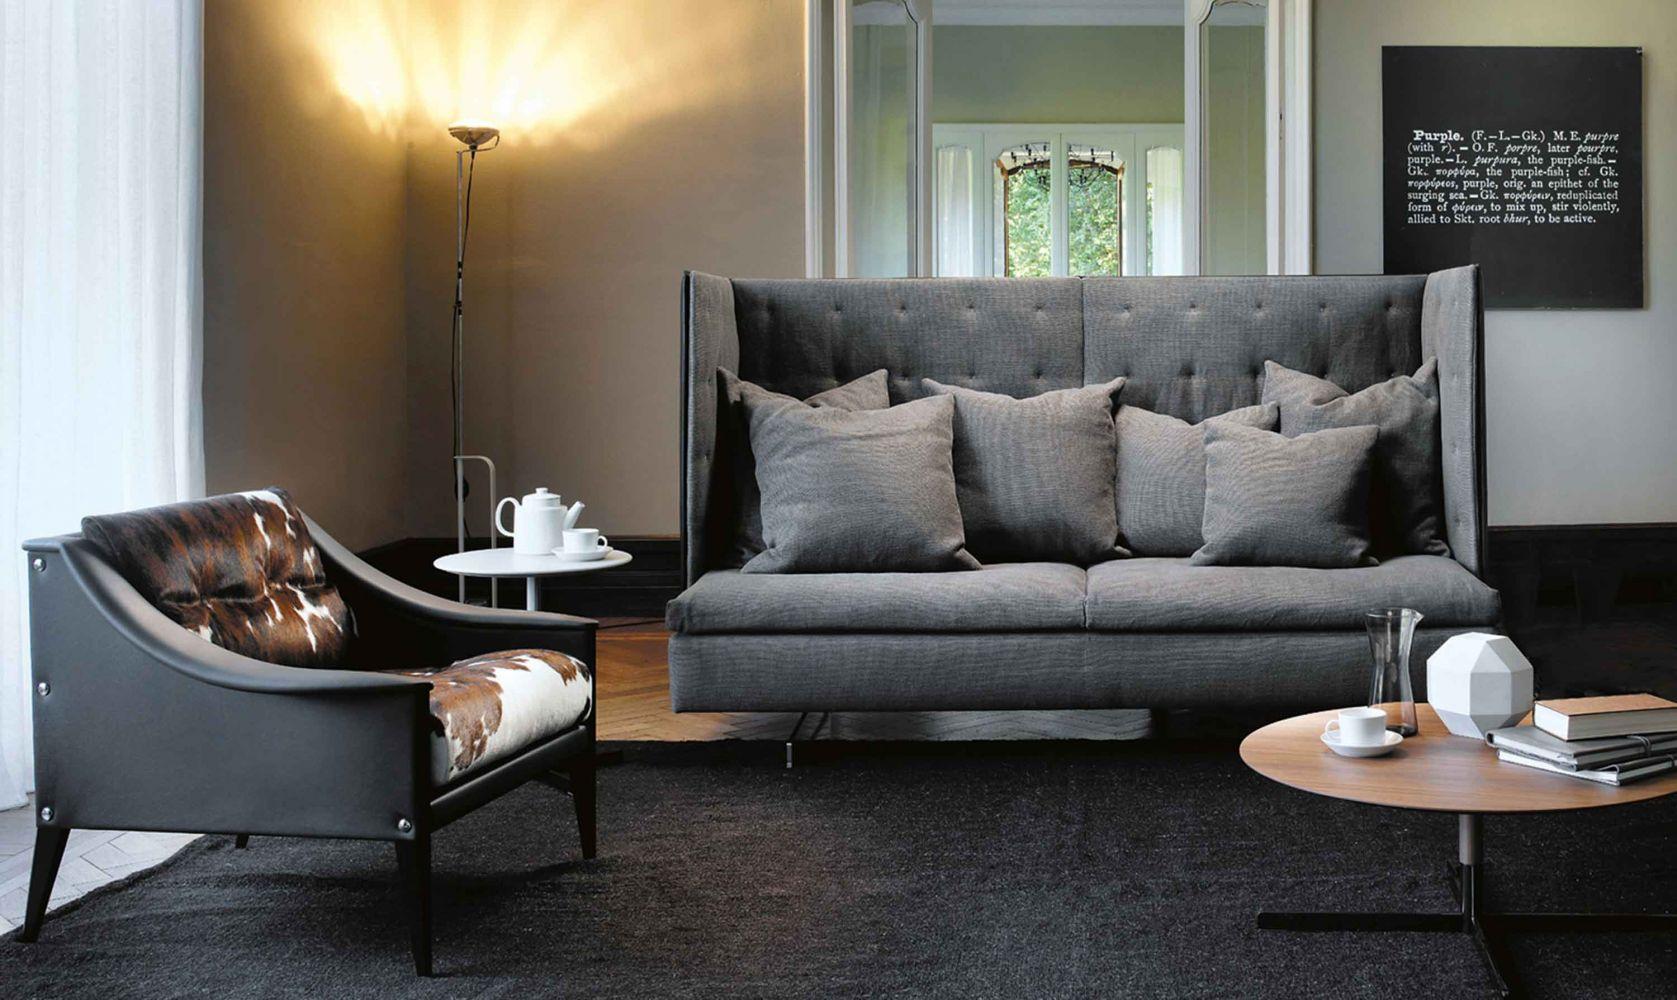 Poltrona Frau / Gärtner Internationale Möbel